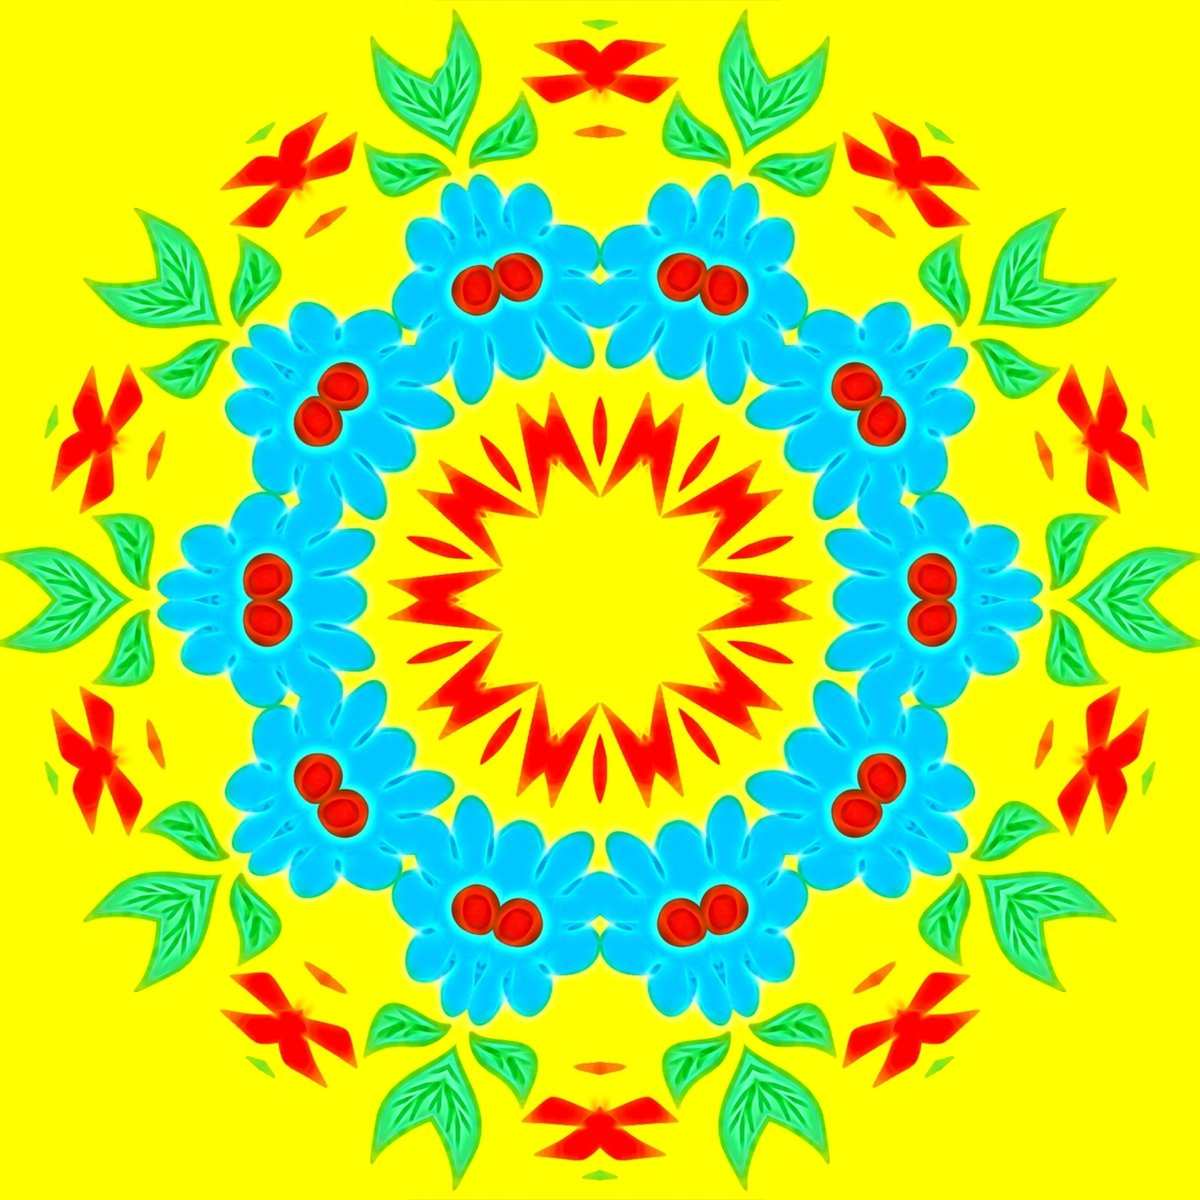 Паттерны и бесшовные текстуры бесплатно / Patterns and seamless textures for free, p_i_r_a_n_y_a - Бесшовная фактура - Незабудки (круги)